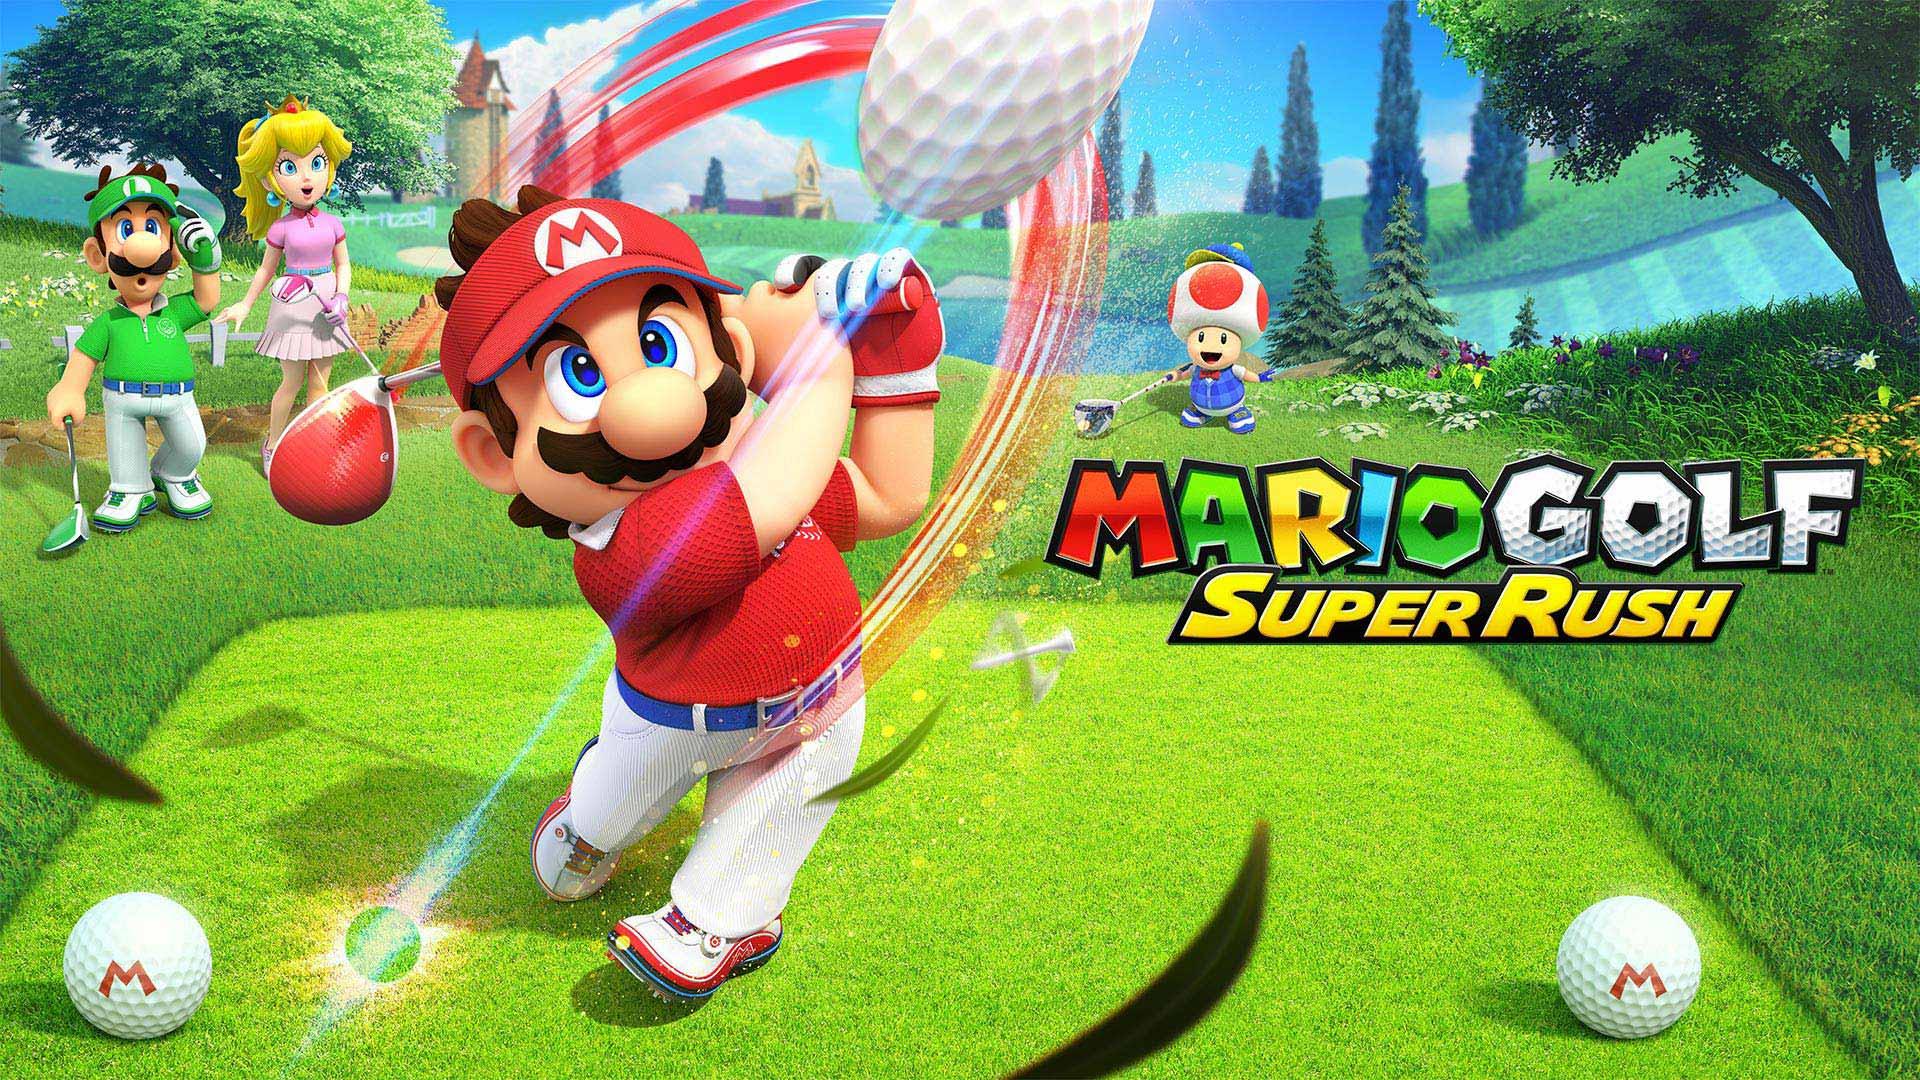 Mario golf surper rush swing sur switch